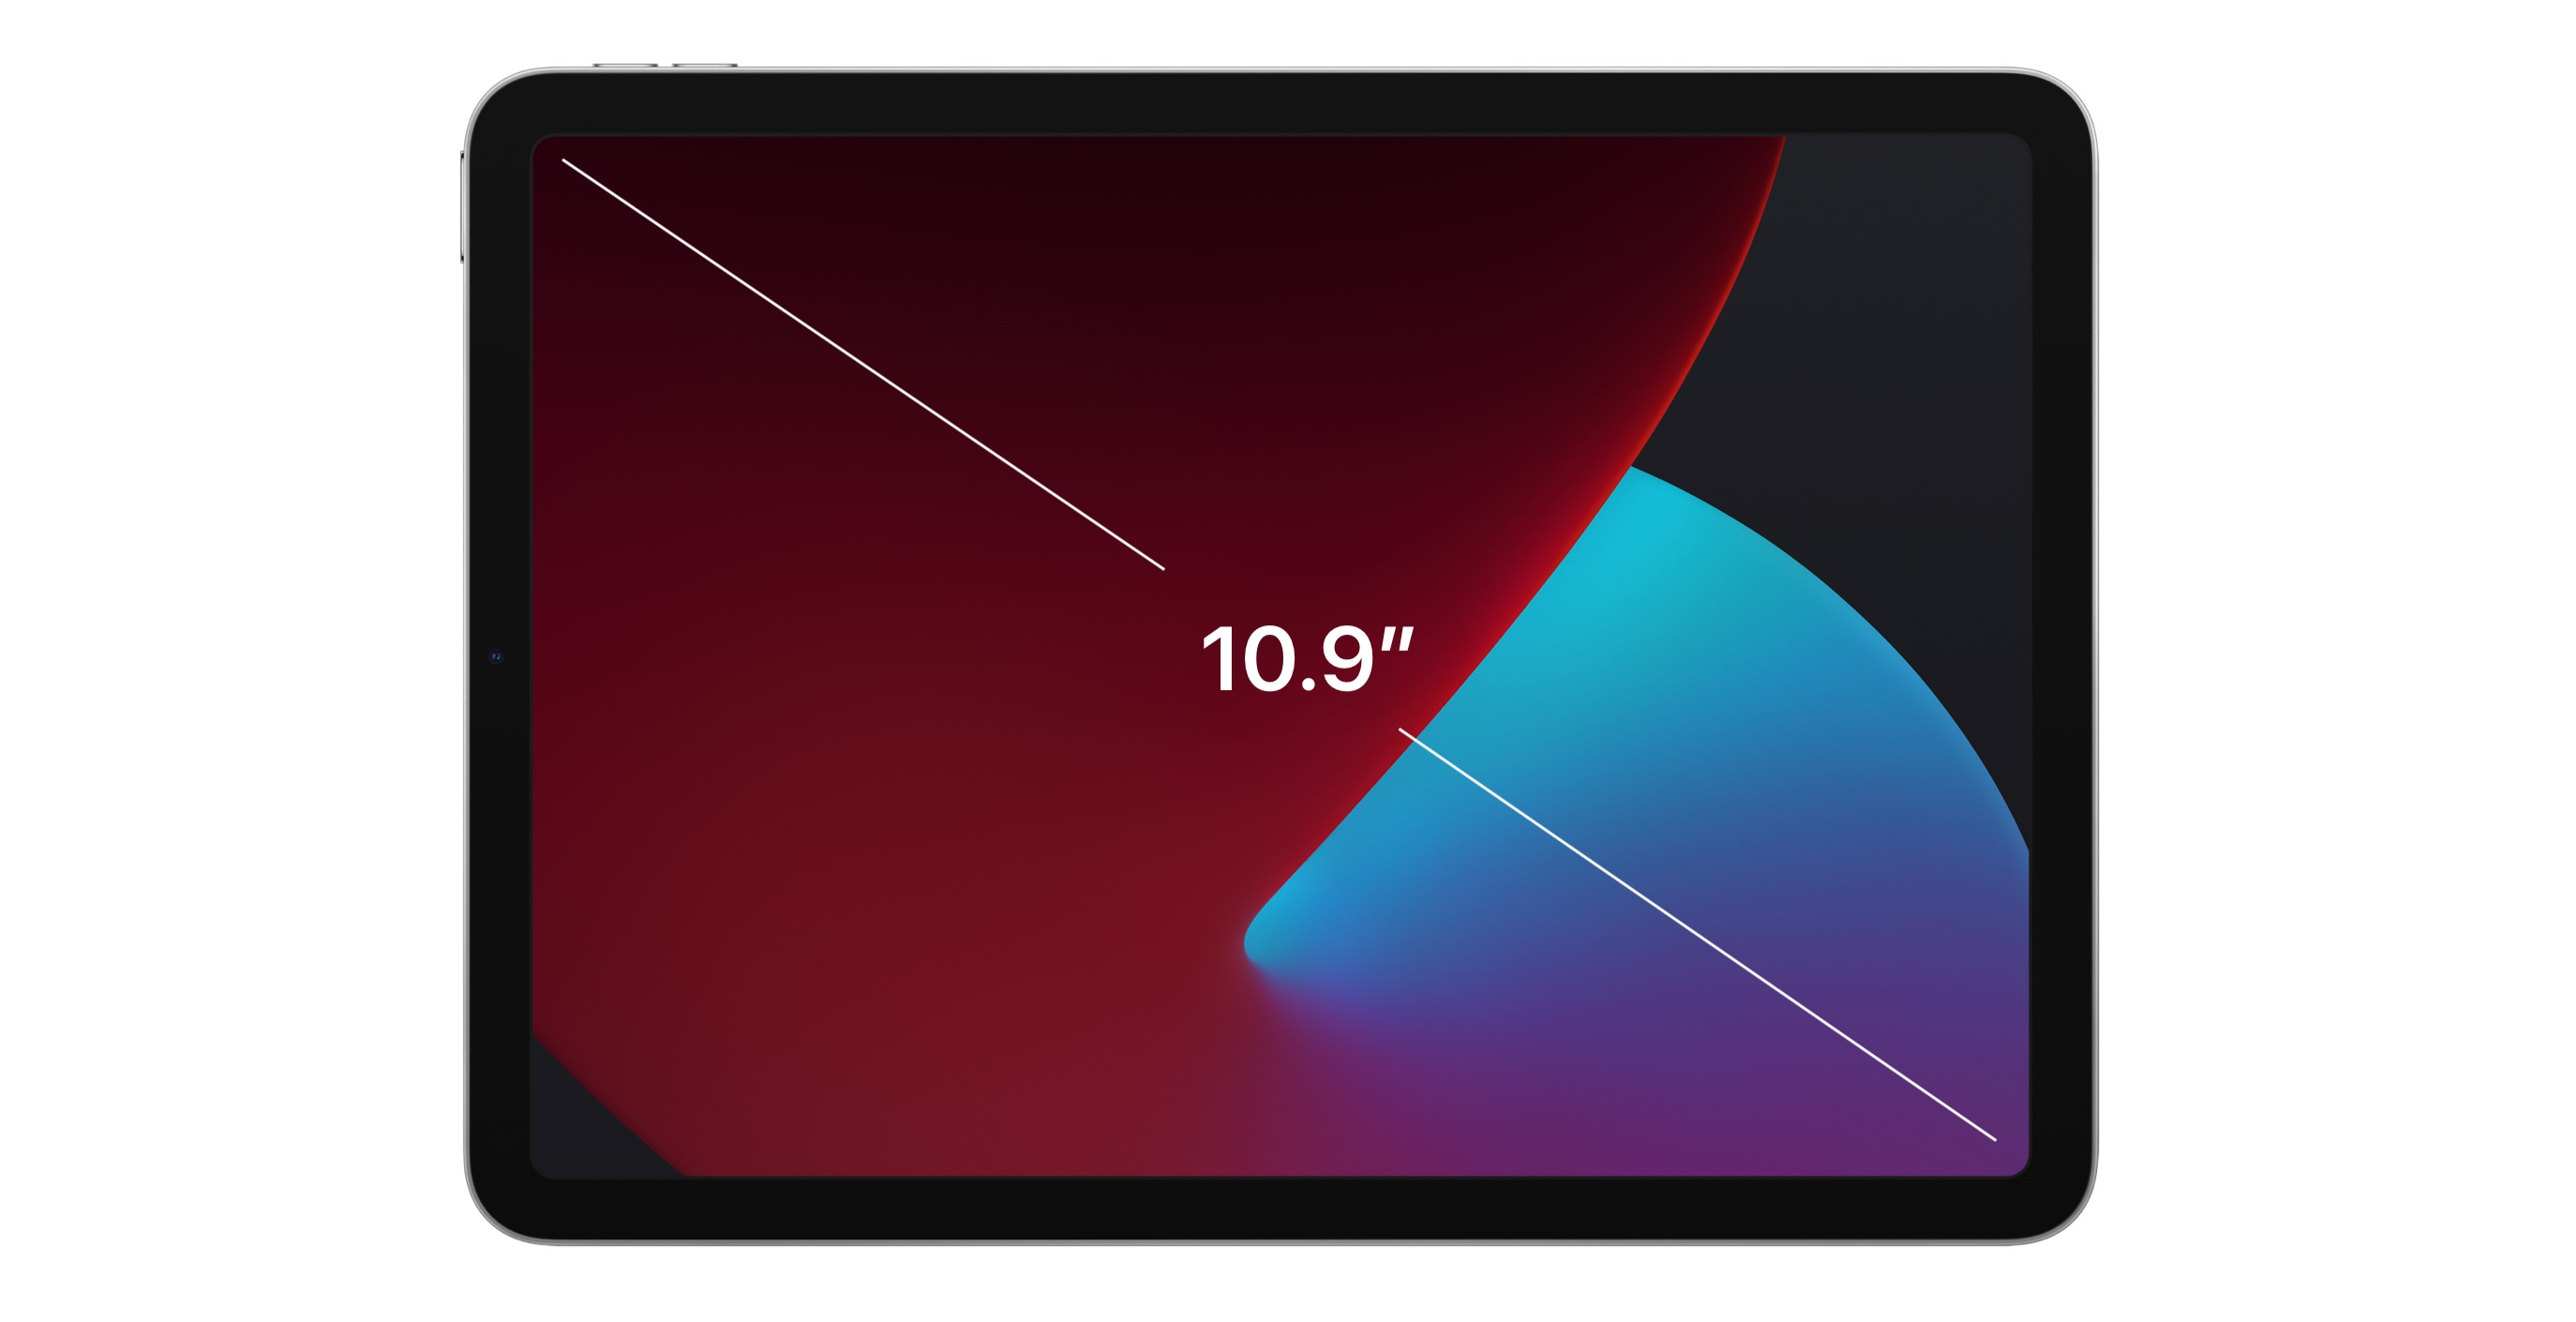 2020 ipad air comparison display